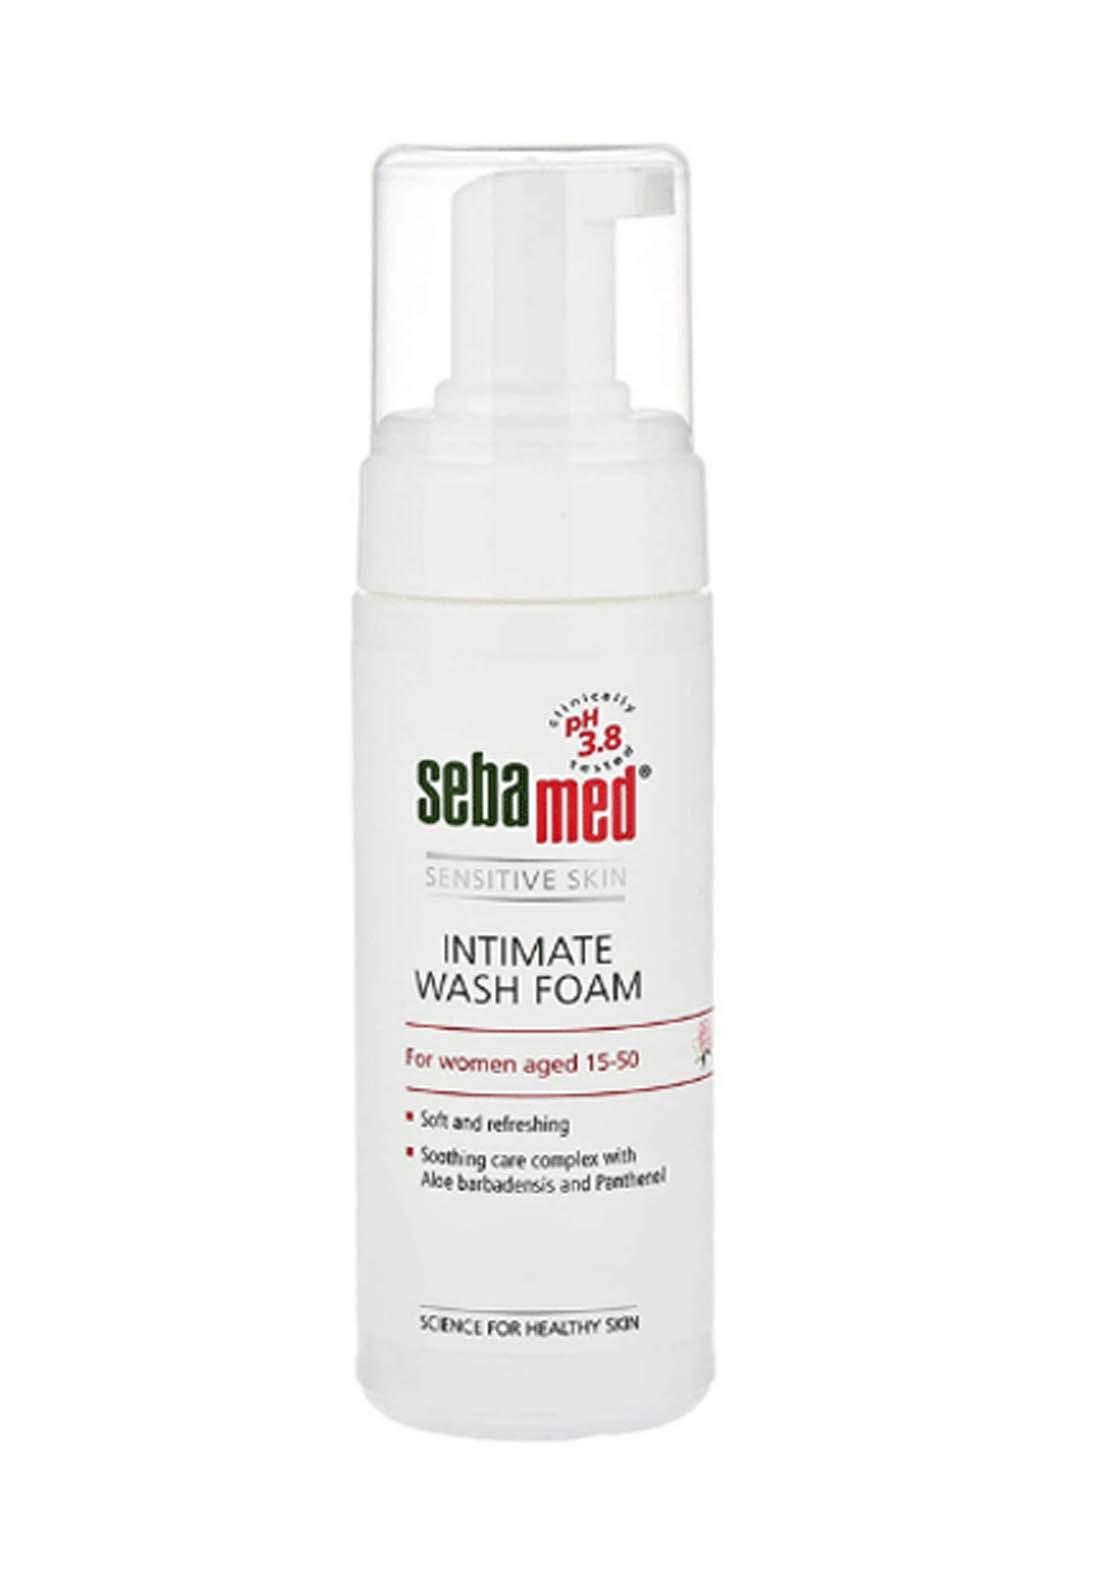 Sebamed Feminine Intimate Wash Foam (15-50) 150ml غسول نسائي رغوي